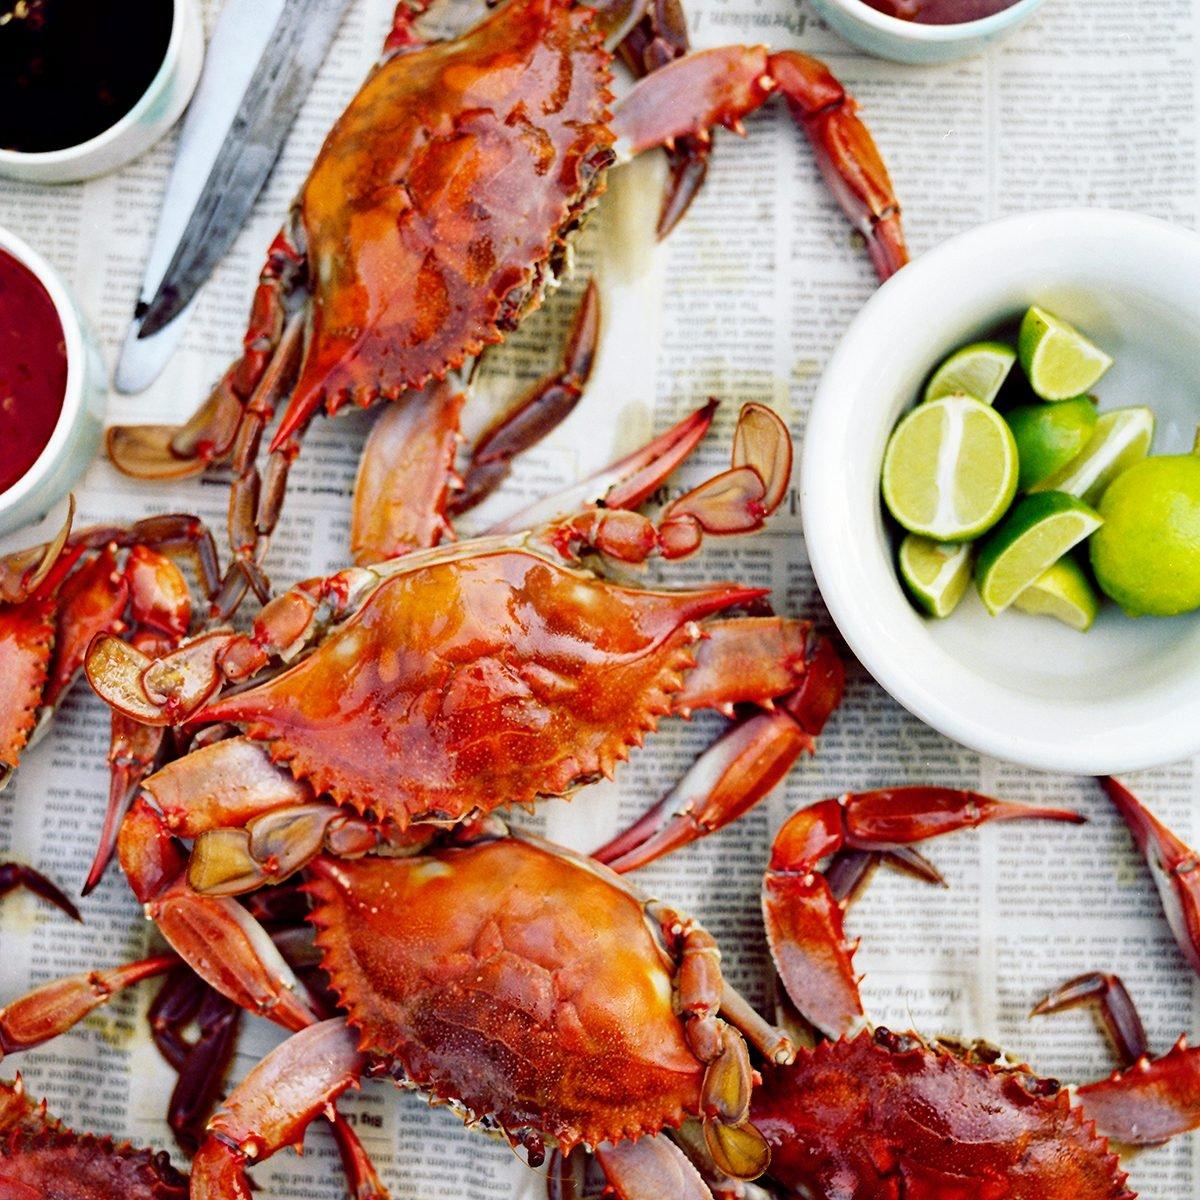 Crabs, Dinner, Meal, Summertime, pleasure